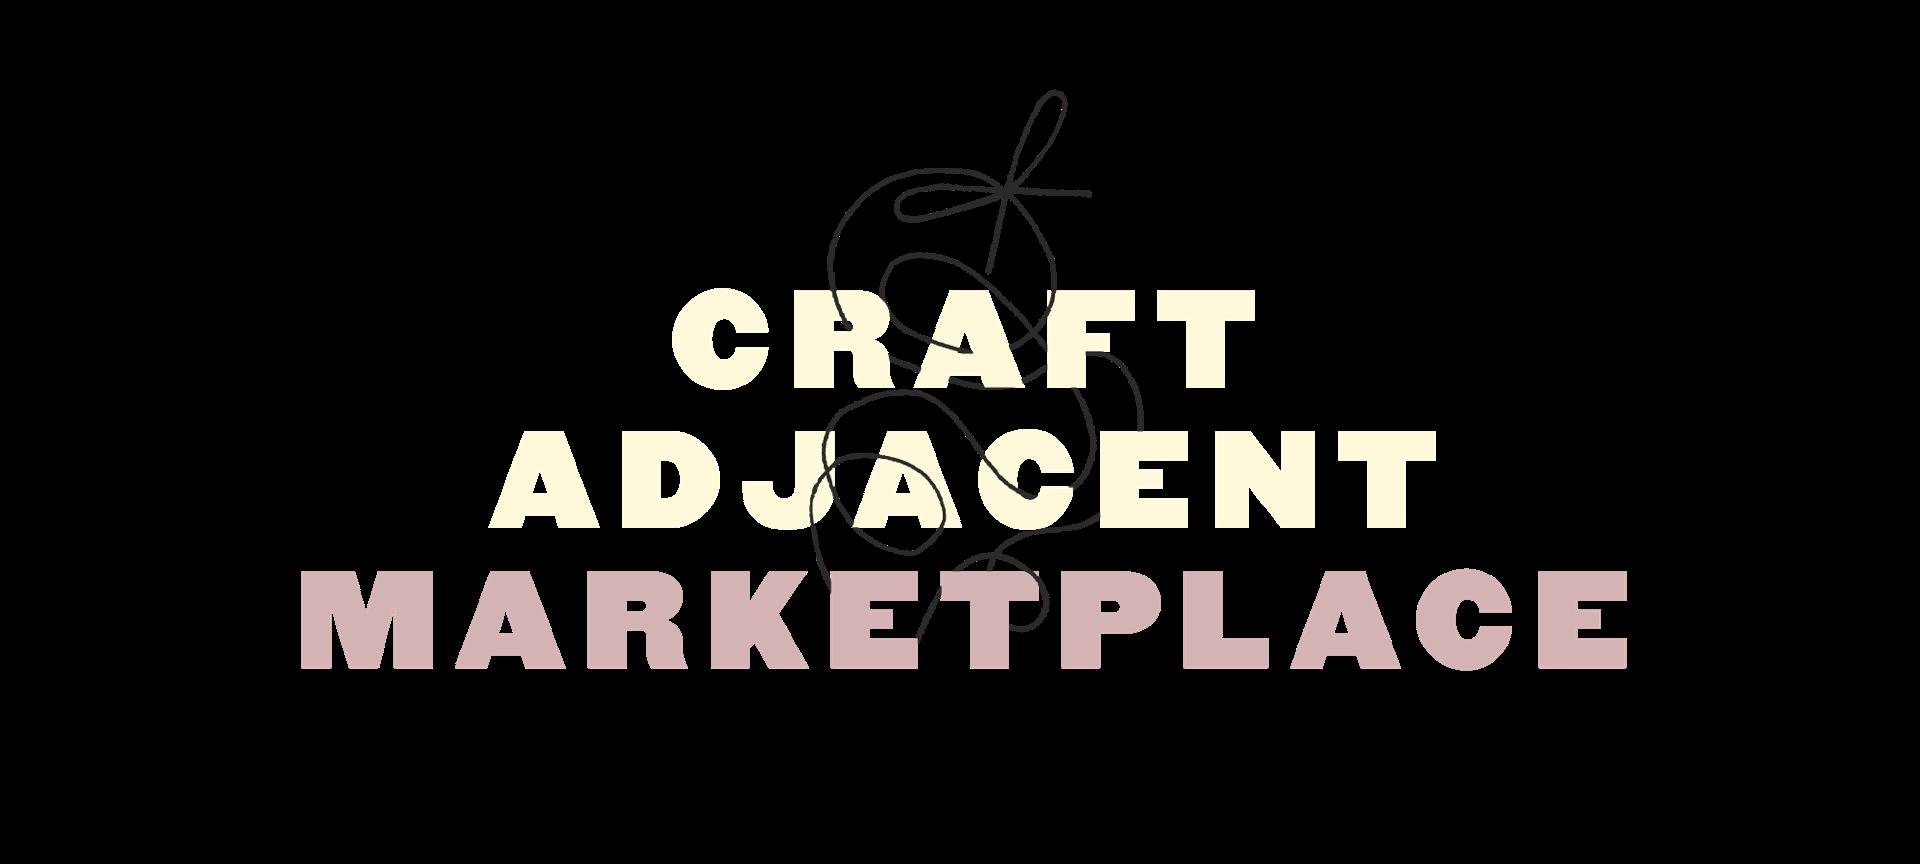 Craft Adjacent Marketplace